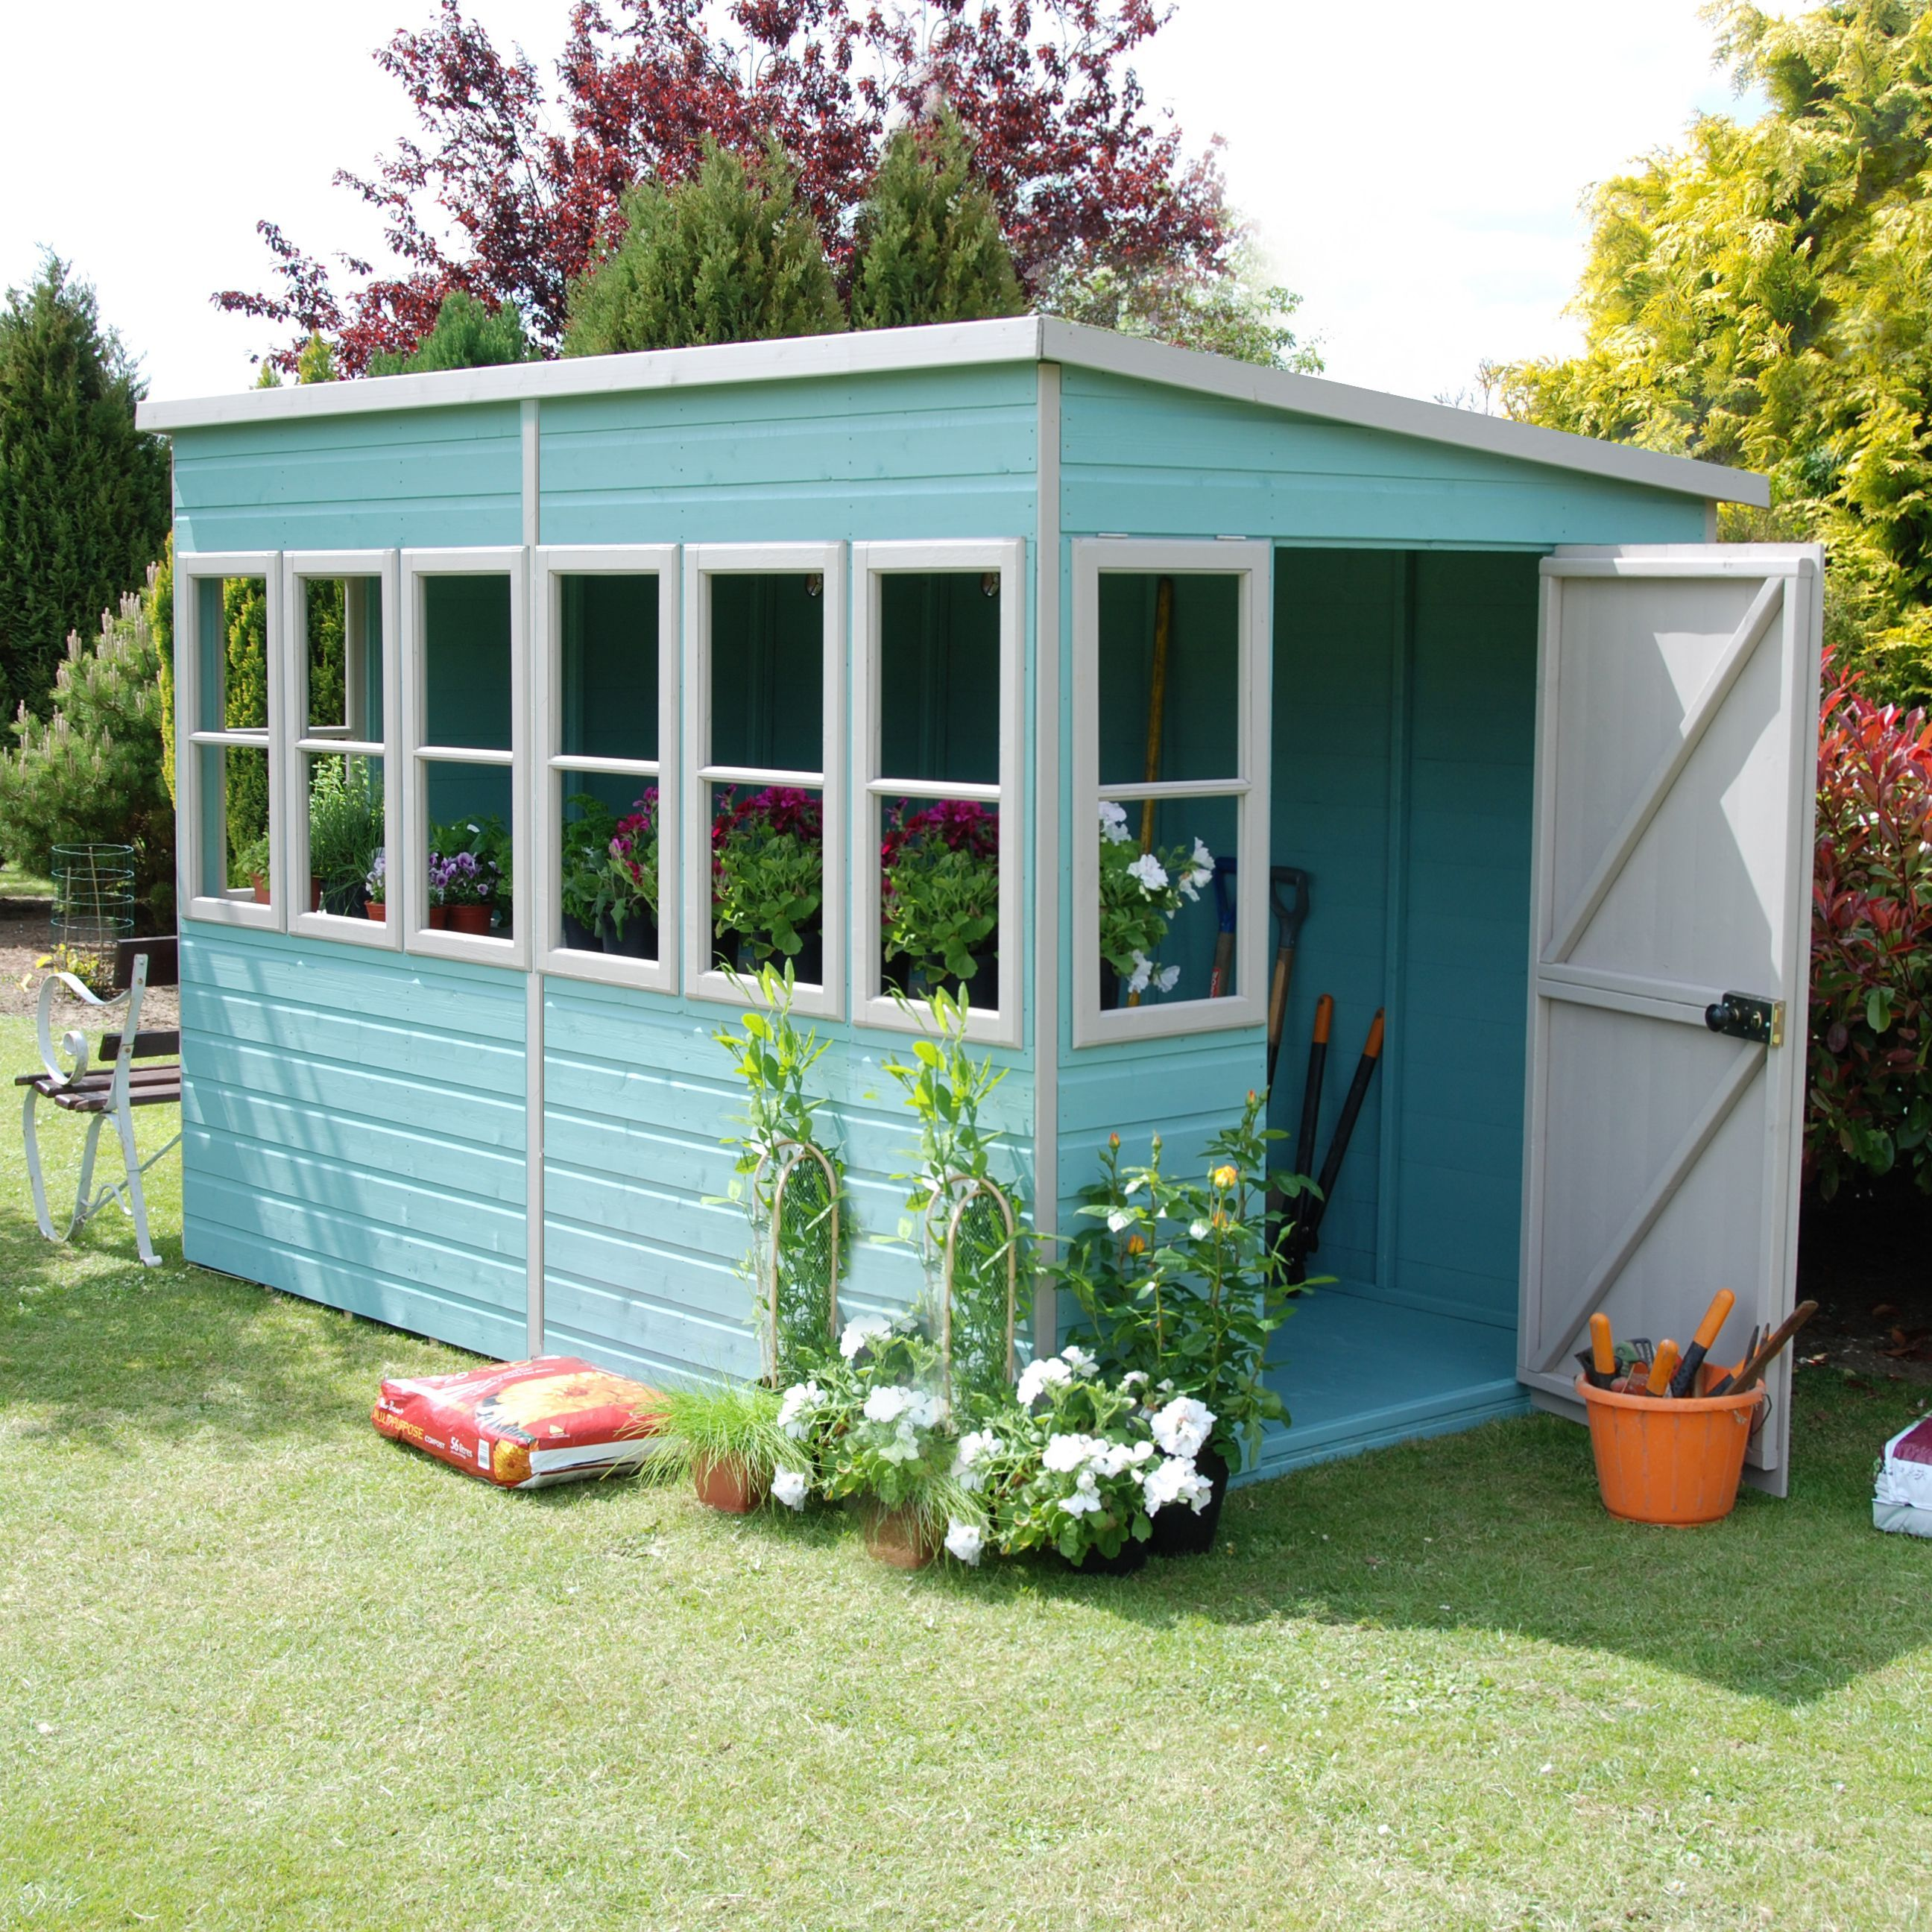 10x6 sun pent pent shiplap wooden shed - Garden Sheds B Q